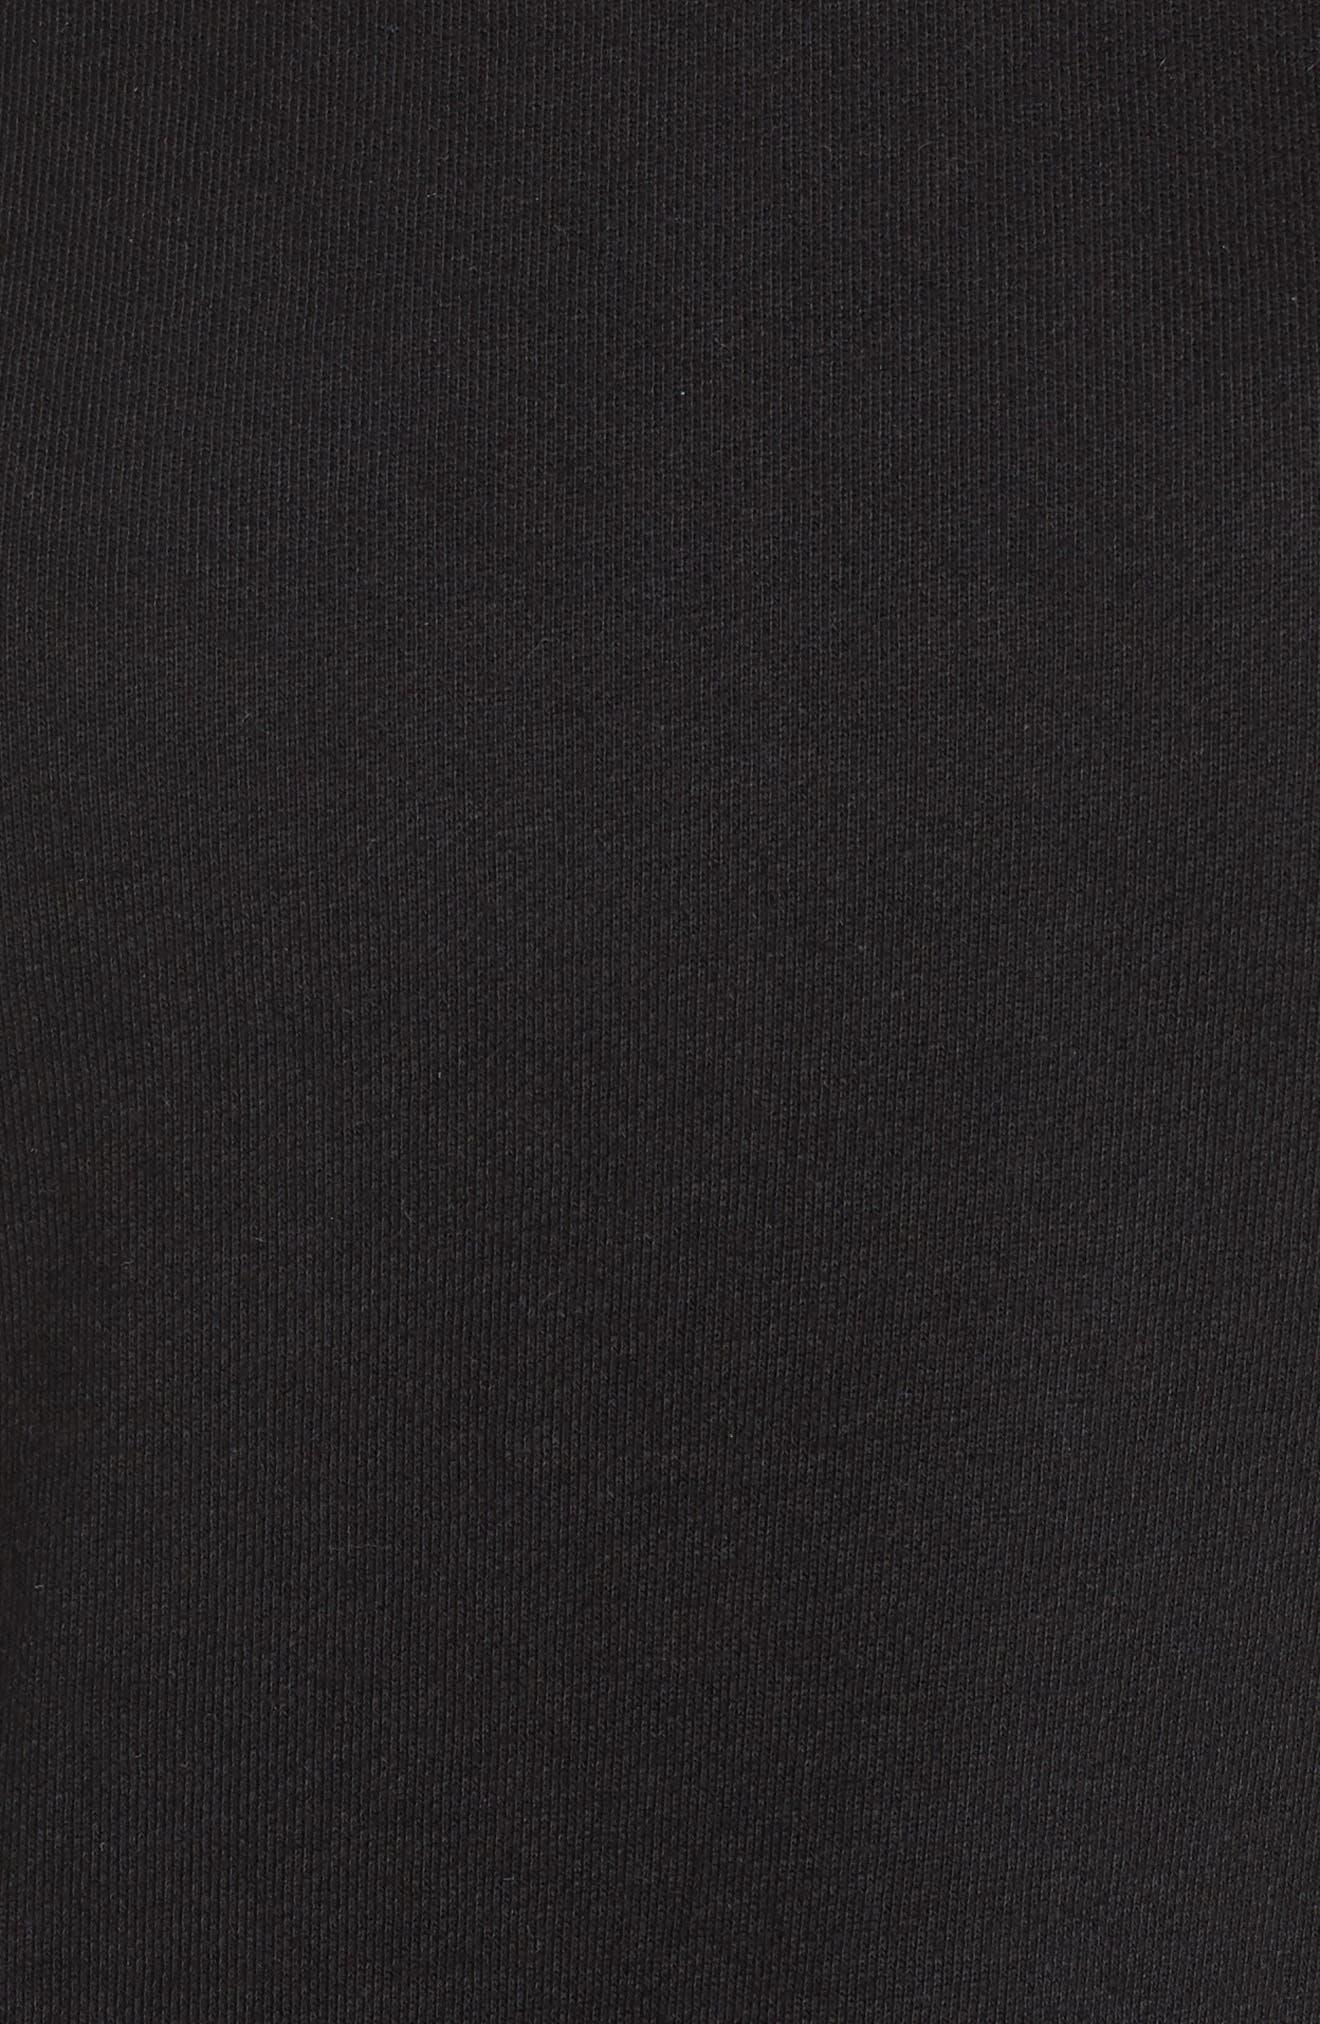 Ruffle Lounge Top,                             Alternate thumbnail 6, color,                             Faded Black